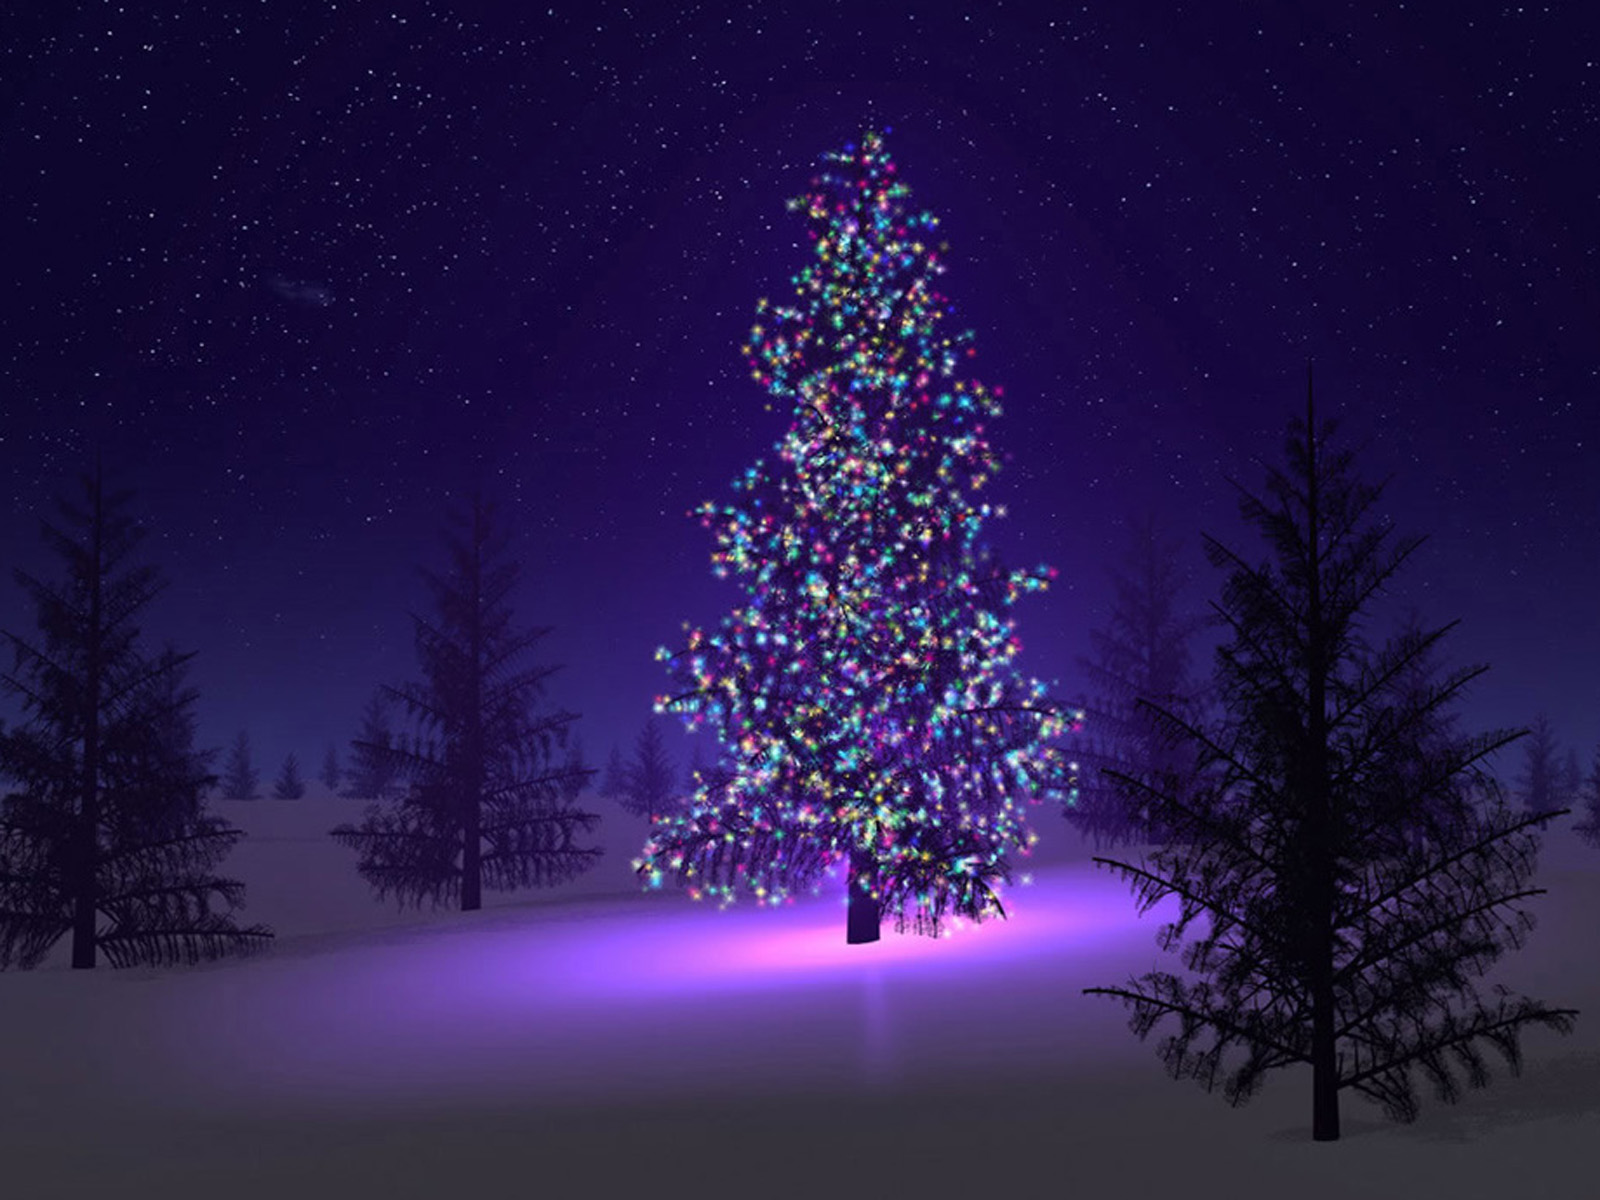 Wallpaper Christmas Trees Wallpapers